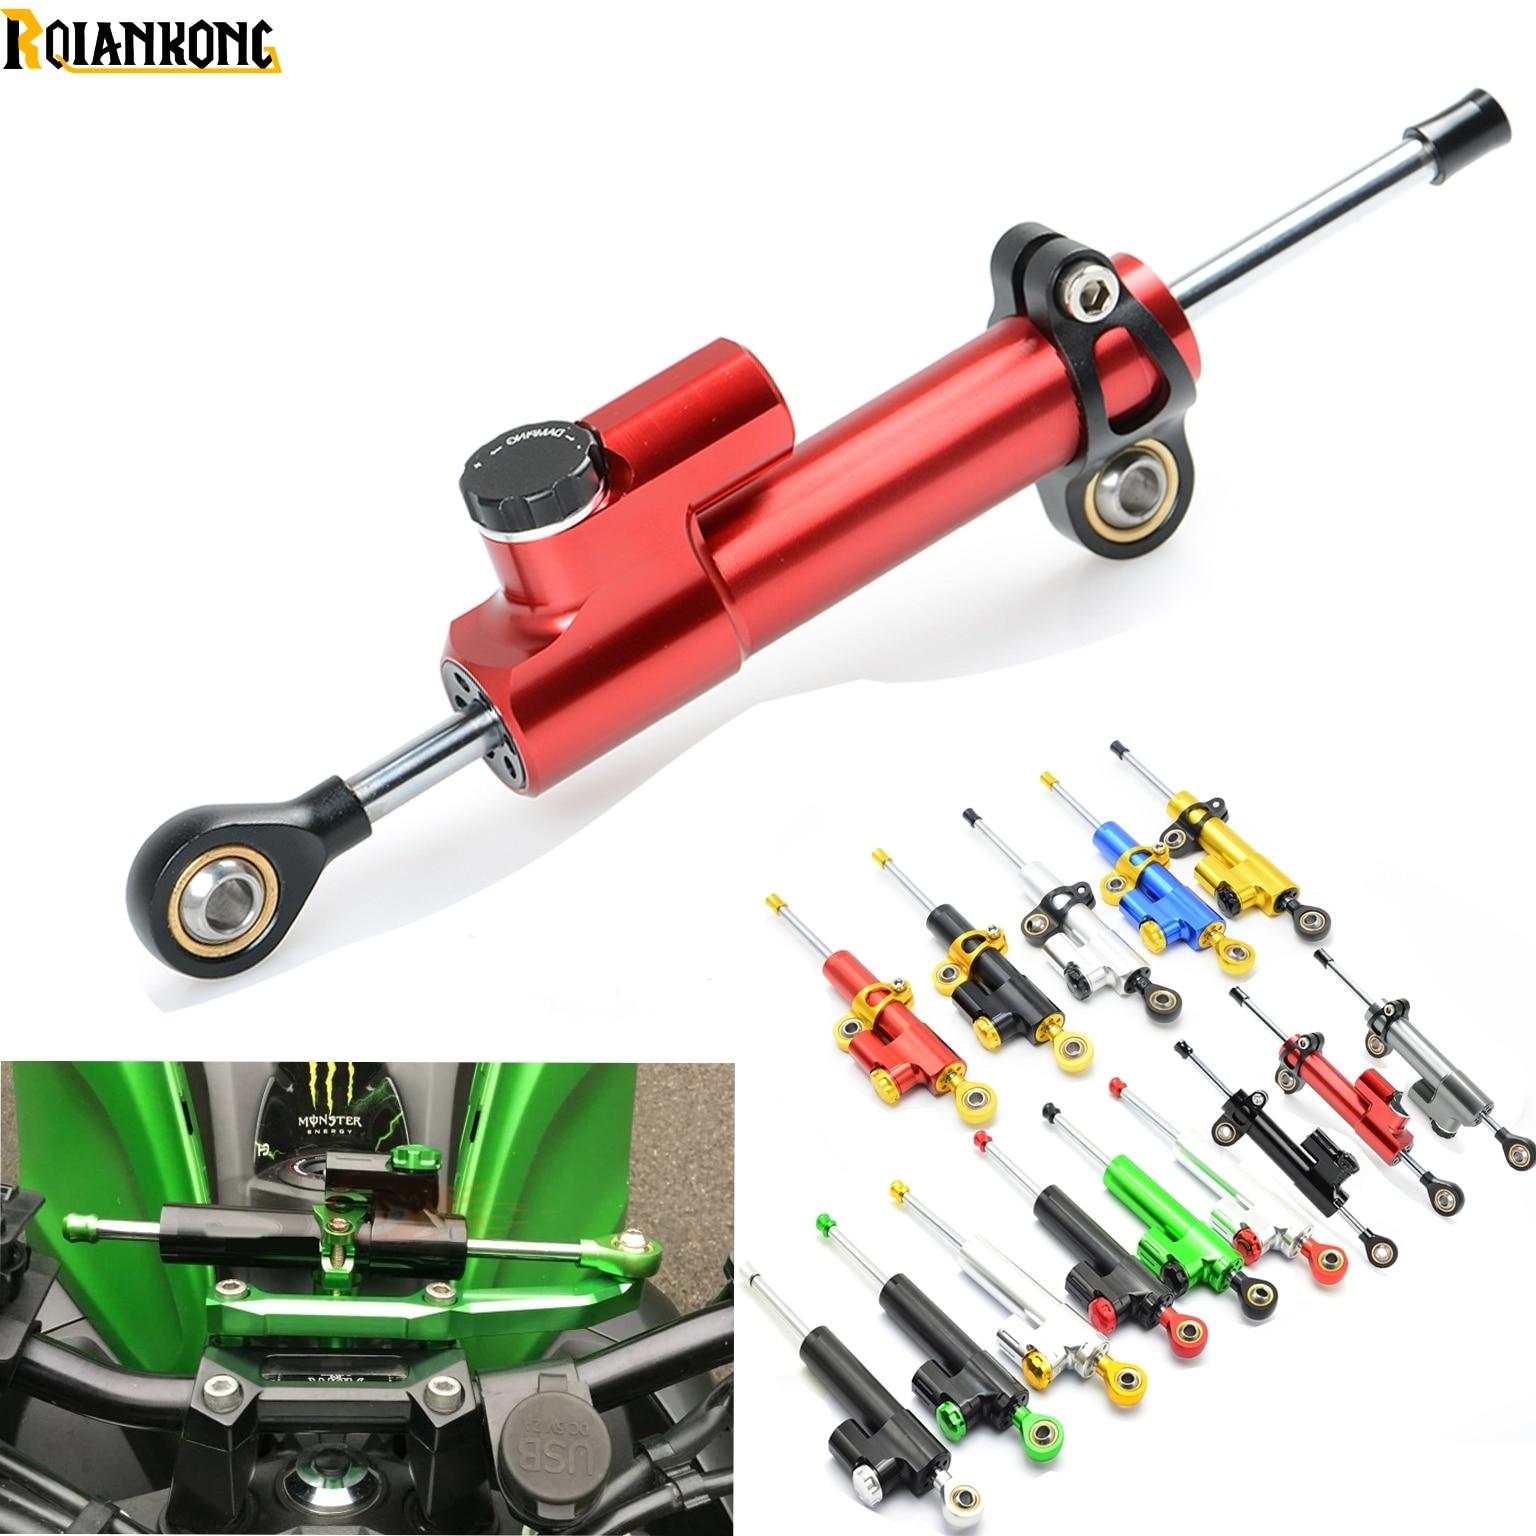 CNC Aluminum Motorcycle Steering Damper Stabilizer Linear Safe Control for Honda CBR1100XX CBR300R CB300F FA CBR500R CB500F X<br>